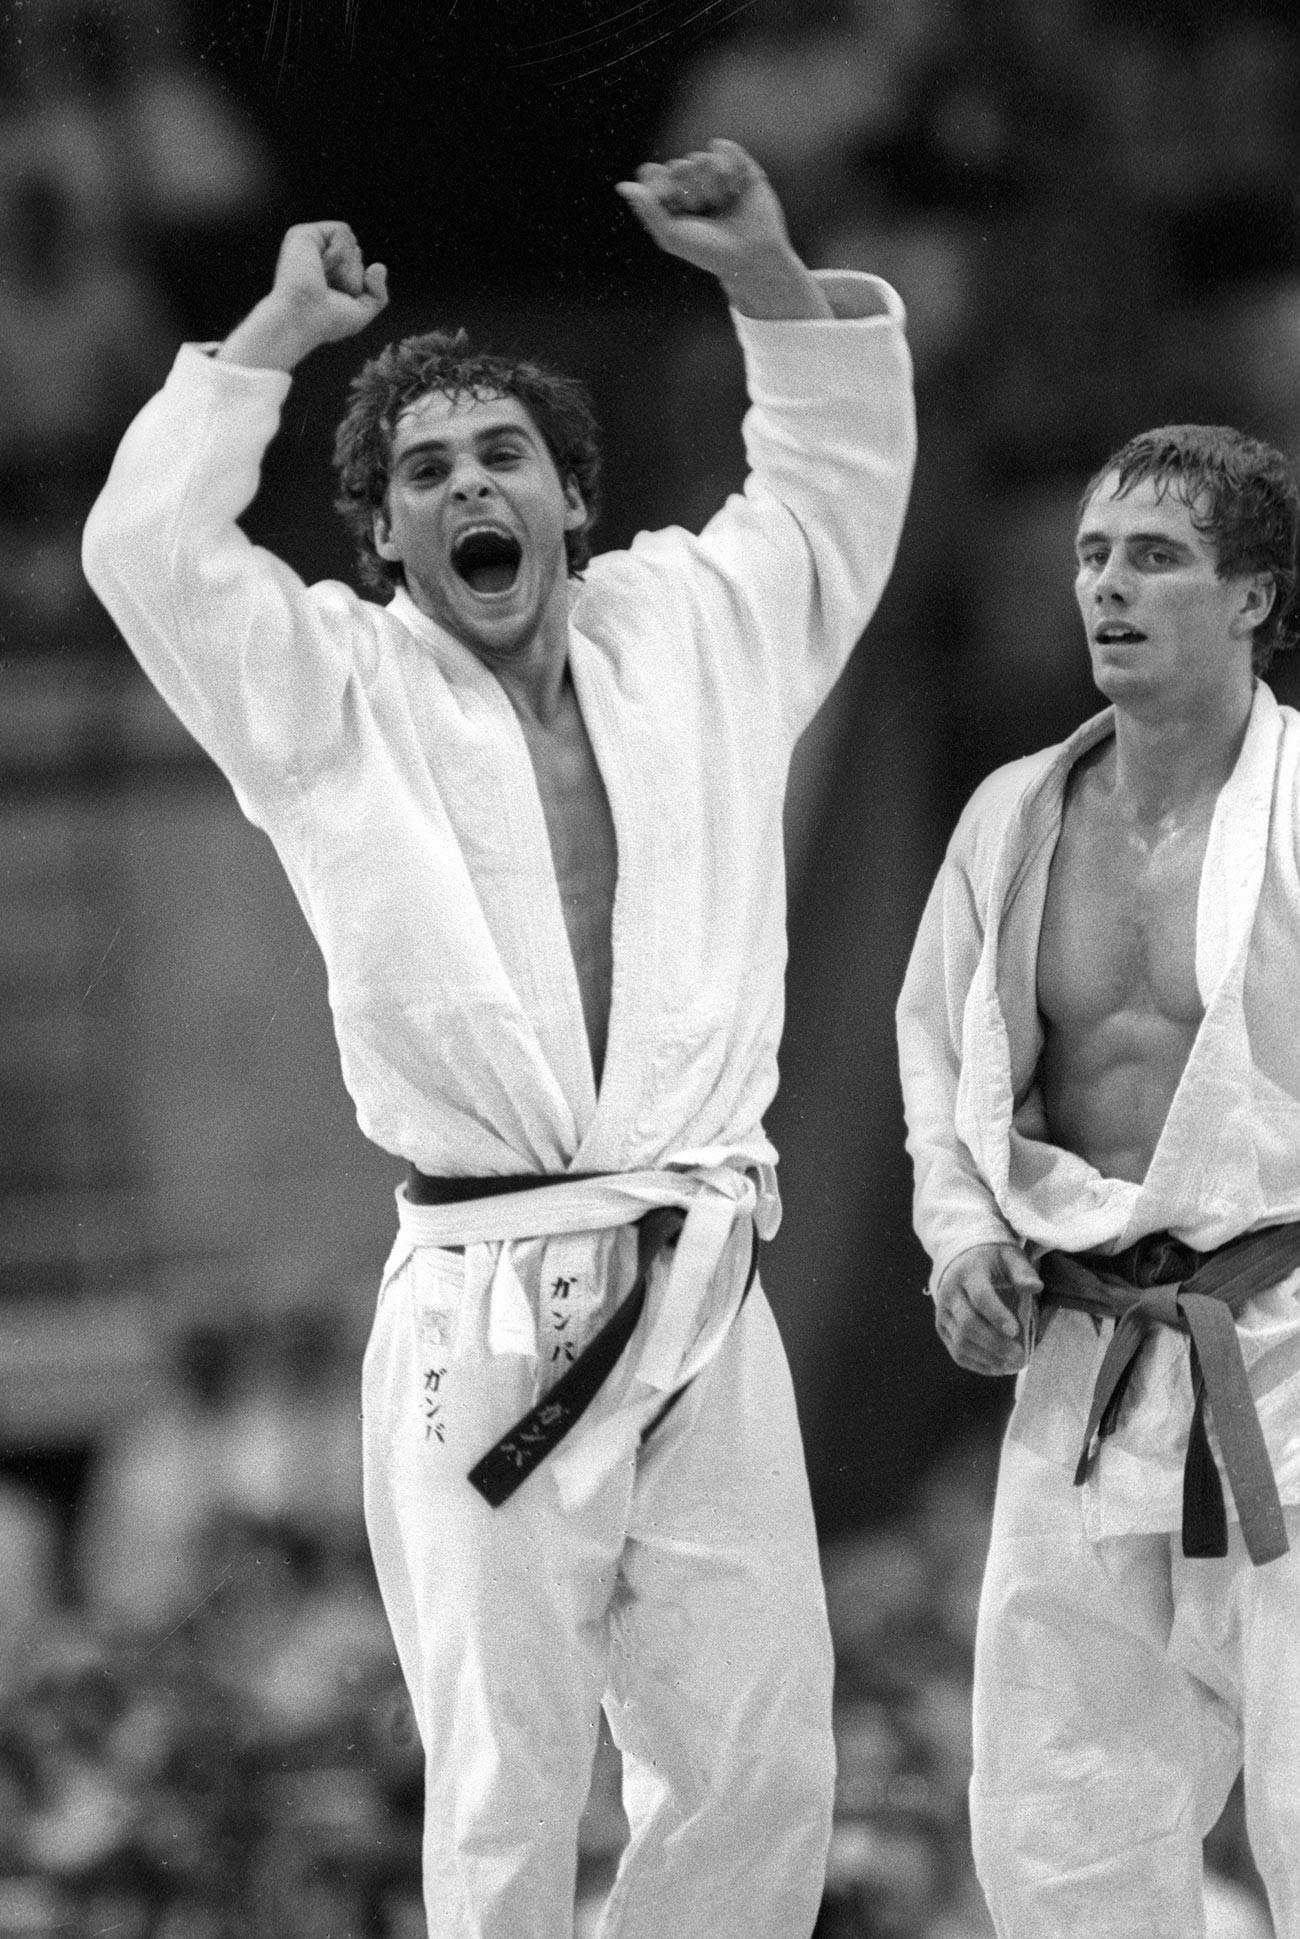 Олимпийский чемпион дзюдоист Эцио Гамба (слева).